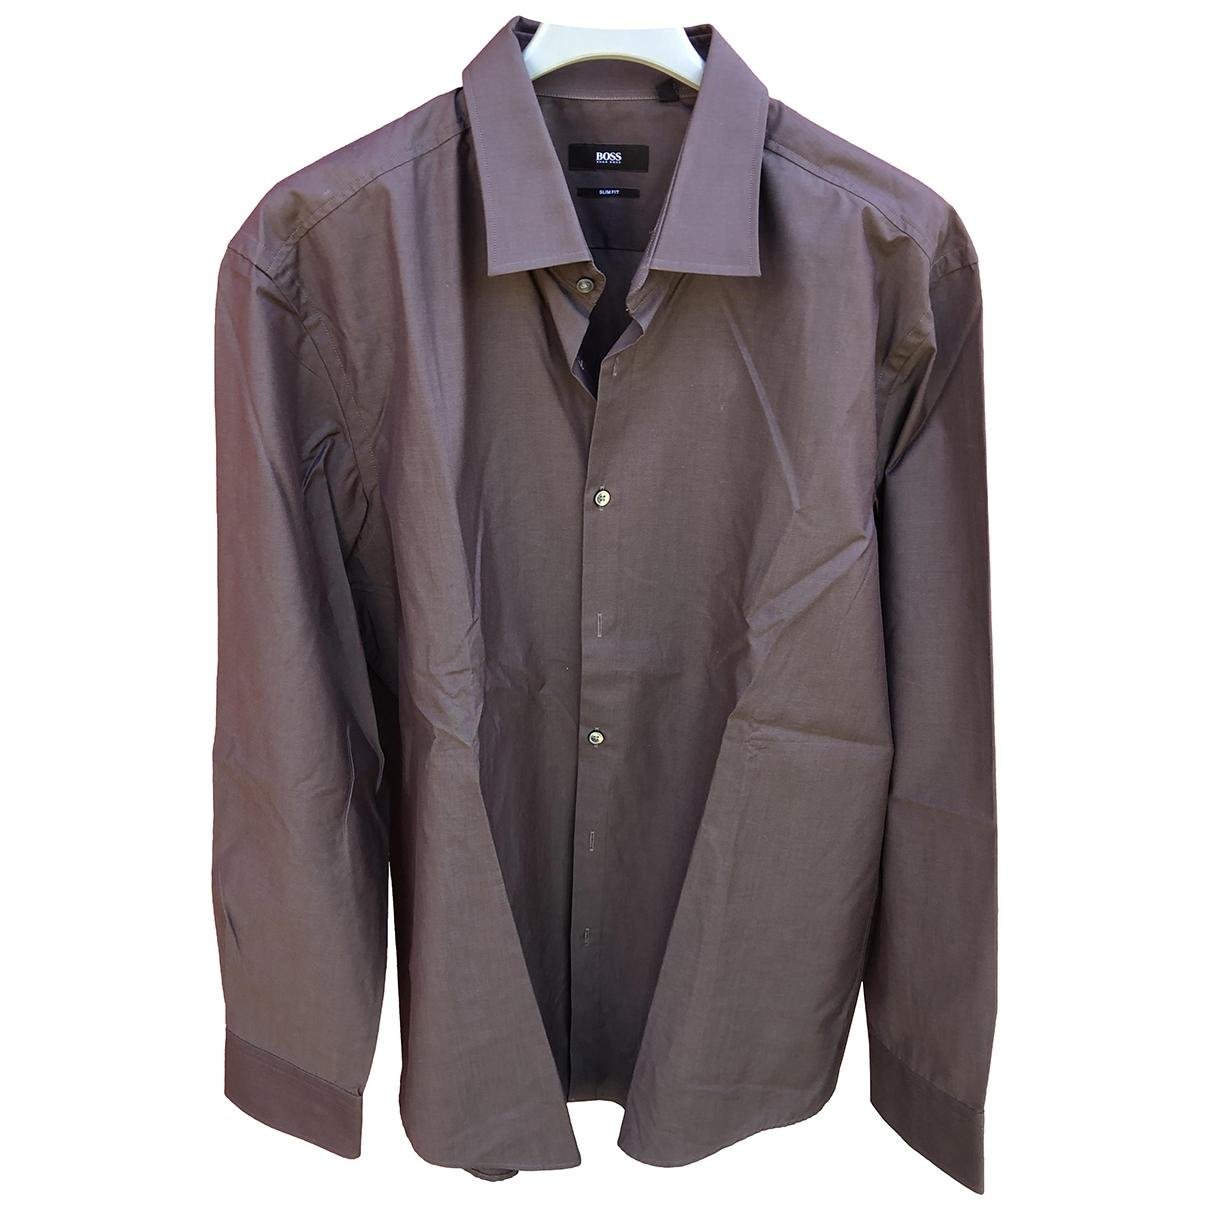 Boss \N Brown Cotton Shirts for Men 17 UK - US (tour de cou / collar)